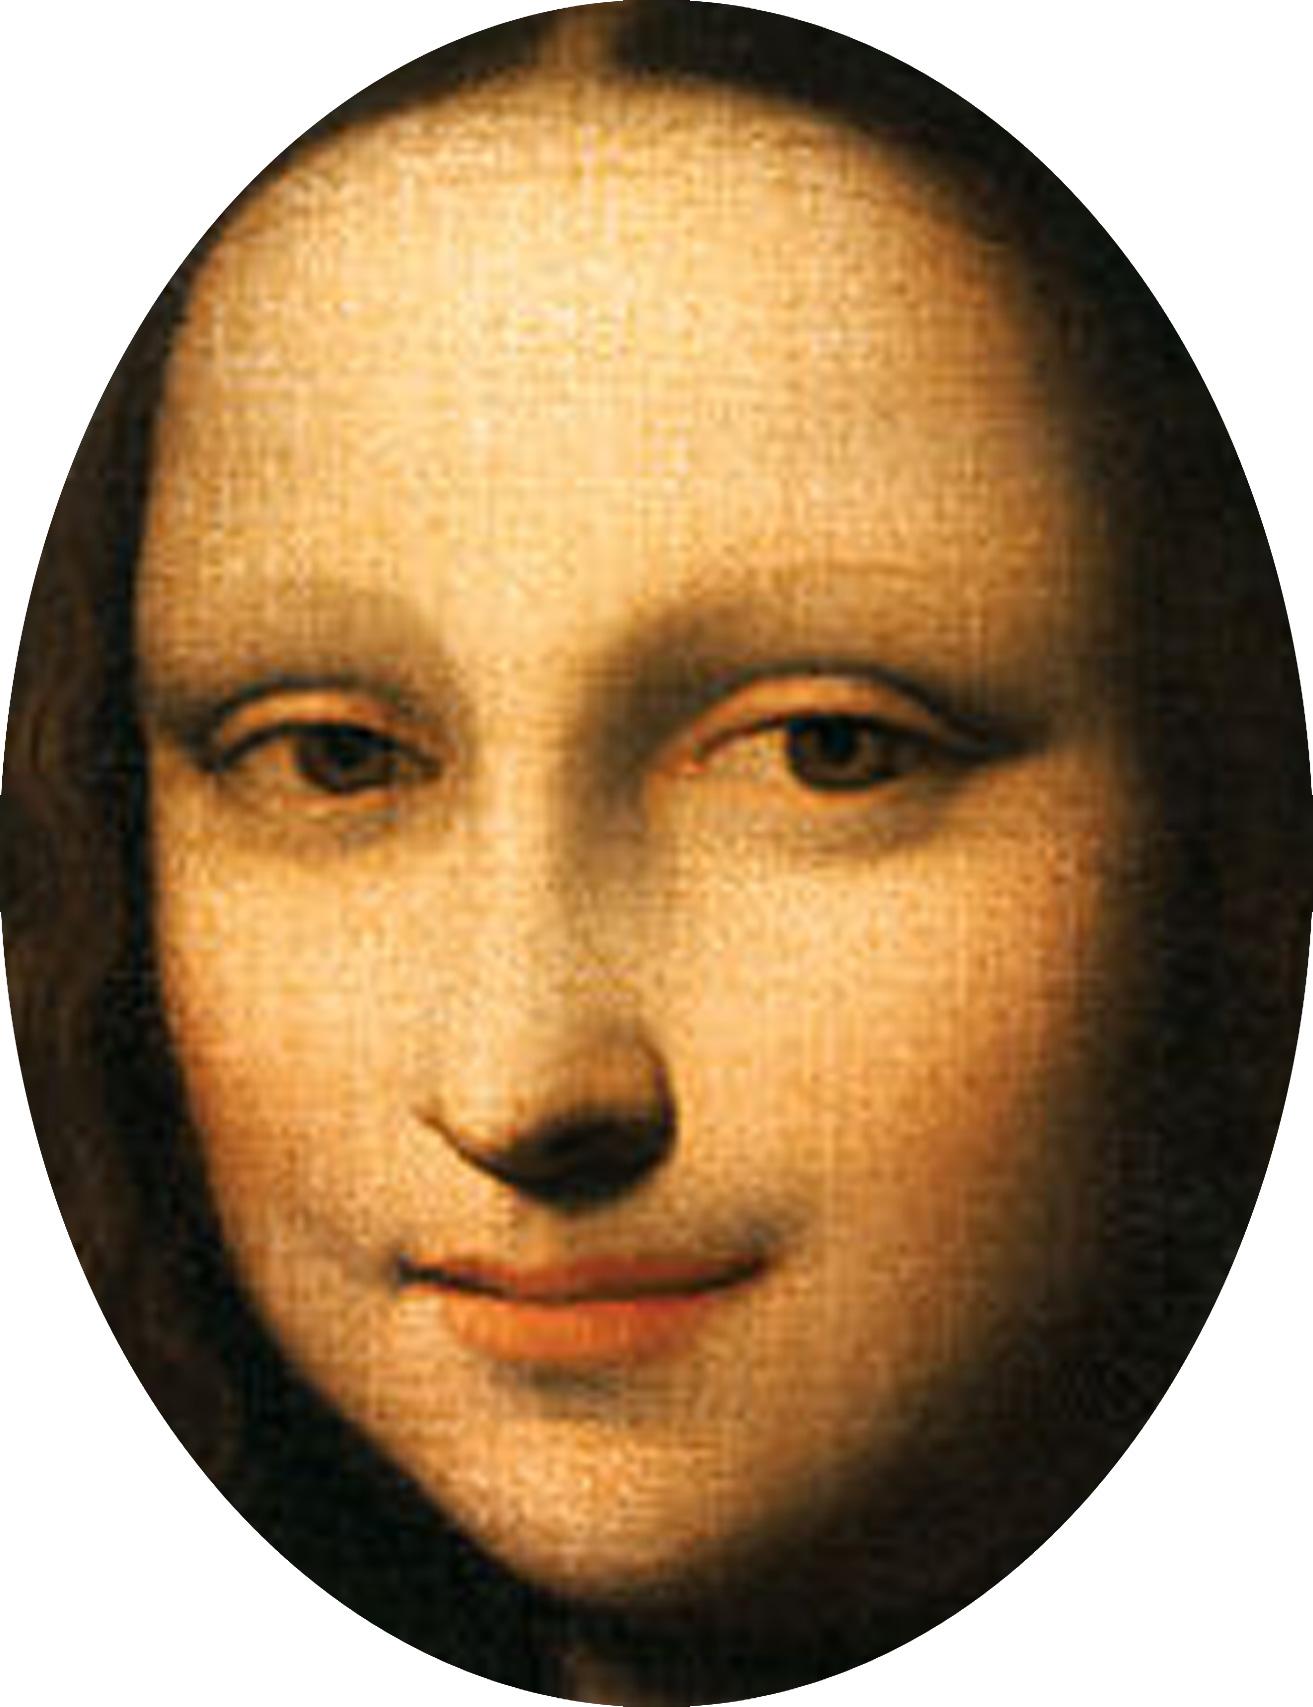 monalisa-isleeorthface.jpg